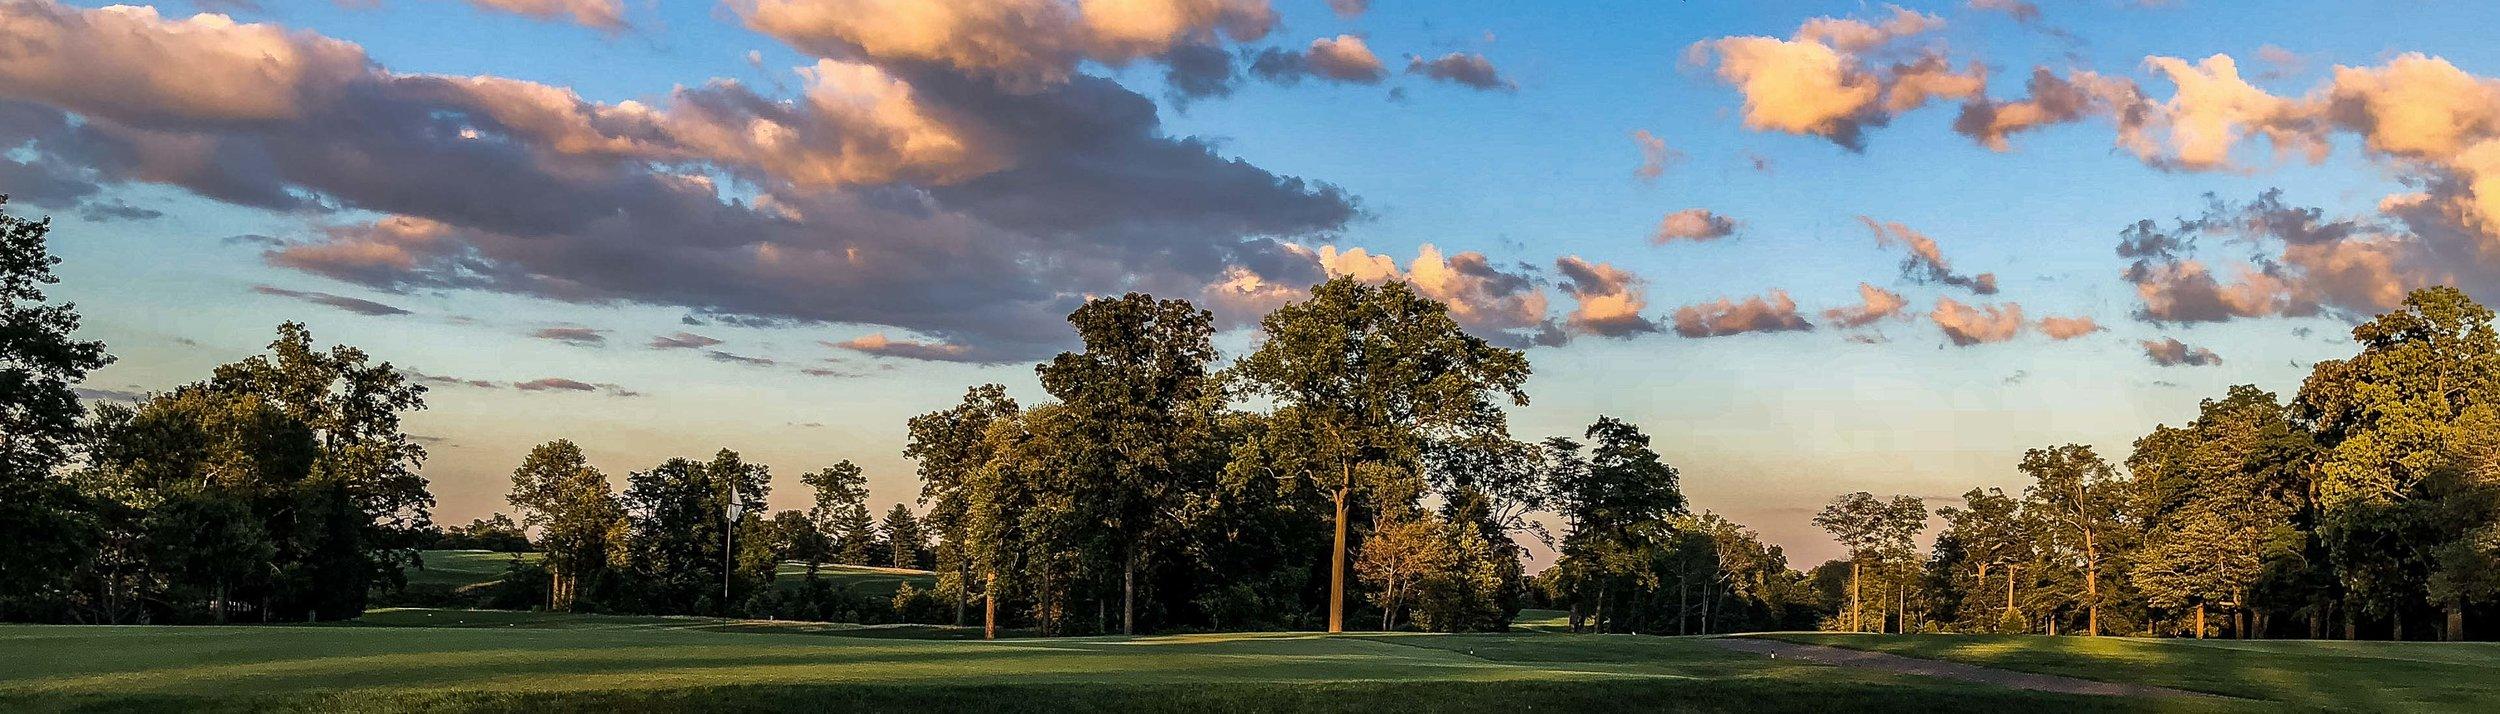 SCC 2018 Golf #18-HAP (4 of 5)-2.jpg